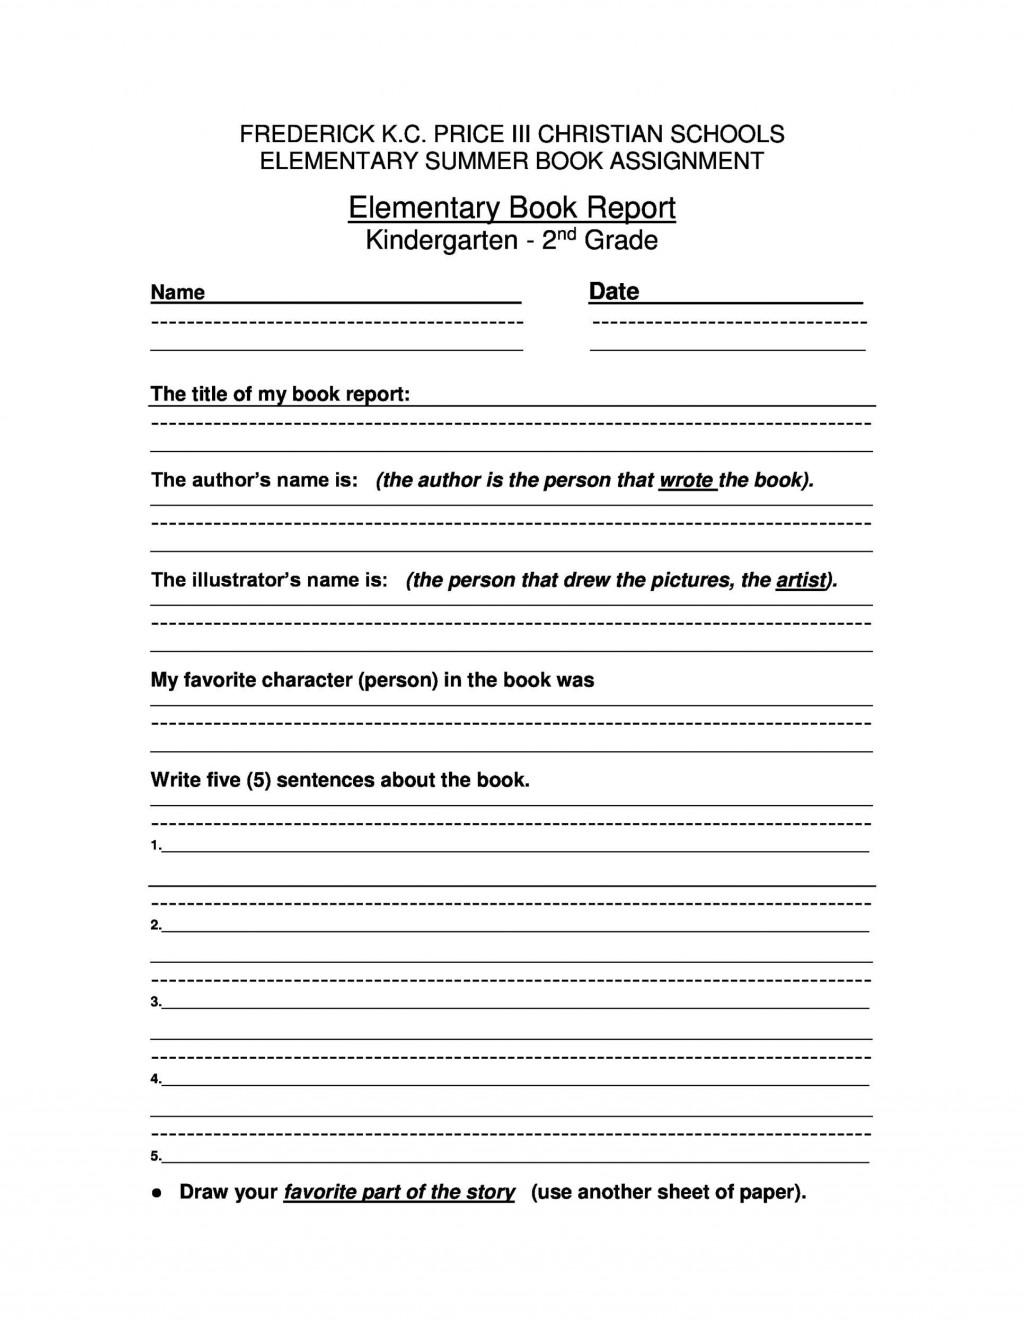 003 Surprising Blank Book Report Form 6th Grade Design  Free Printable TemplateLarge